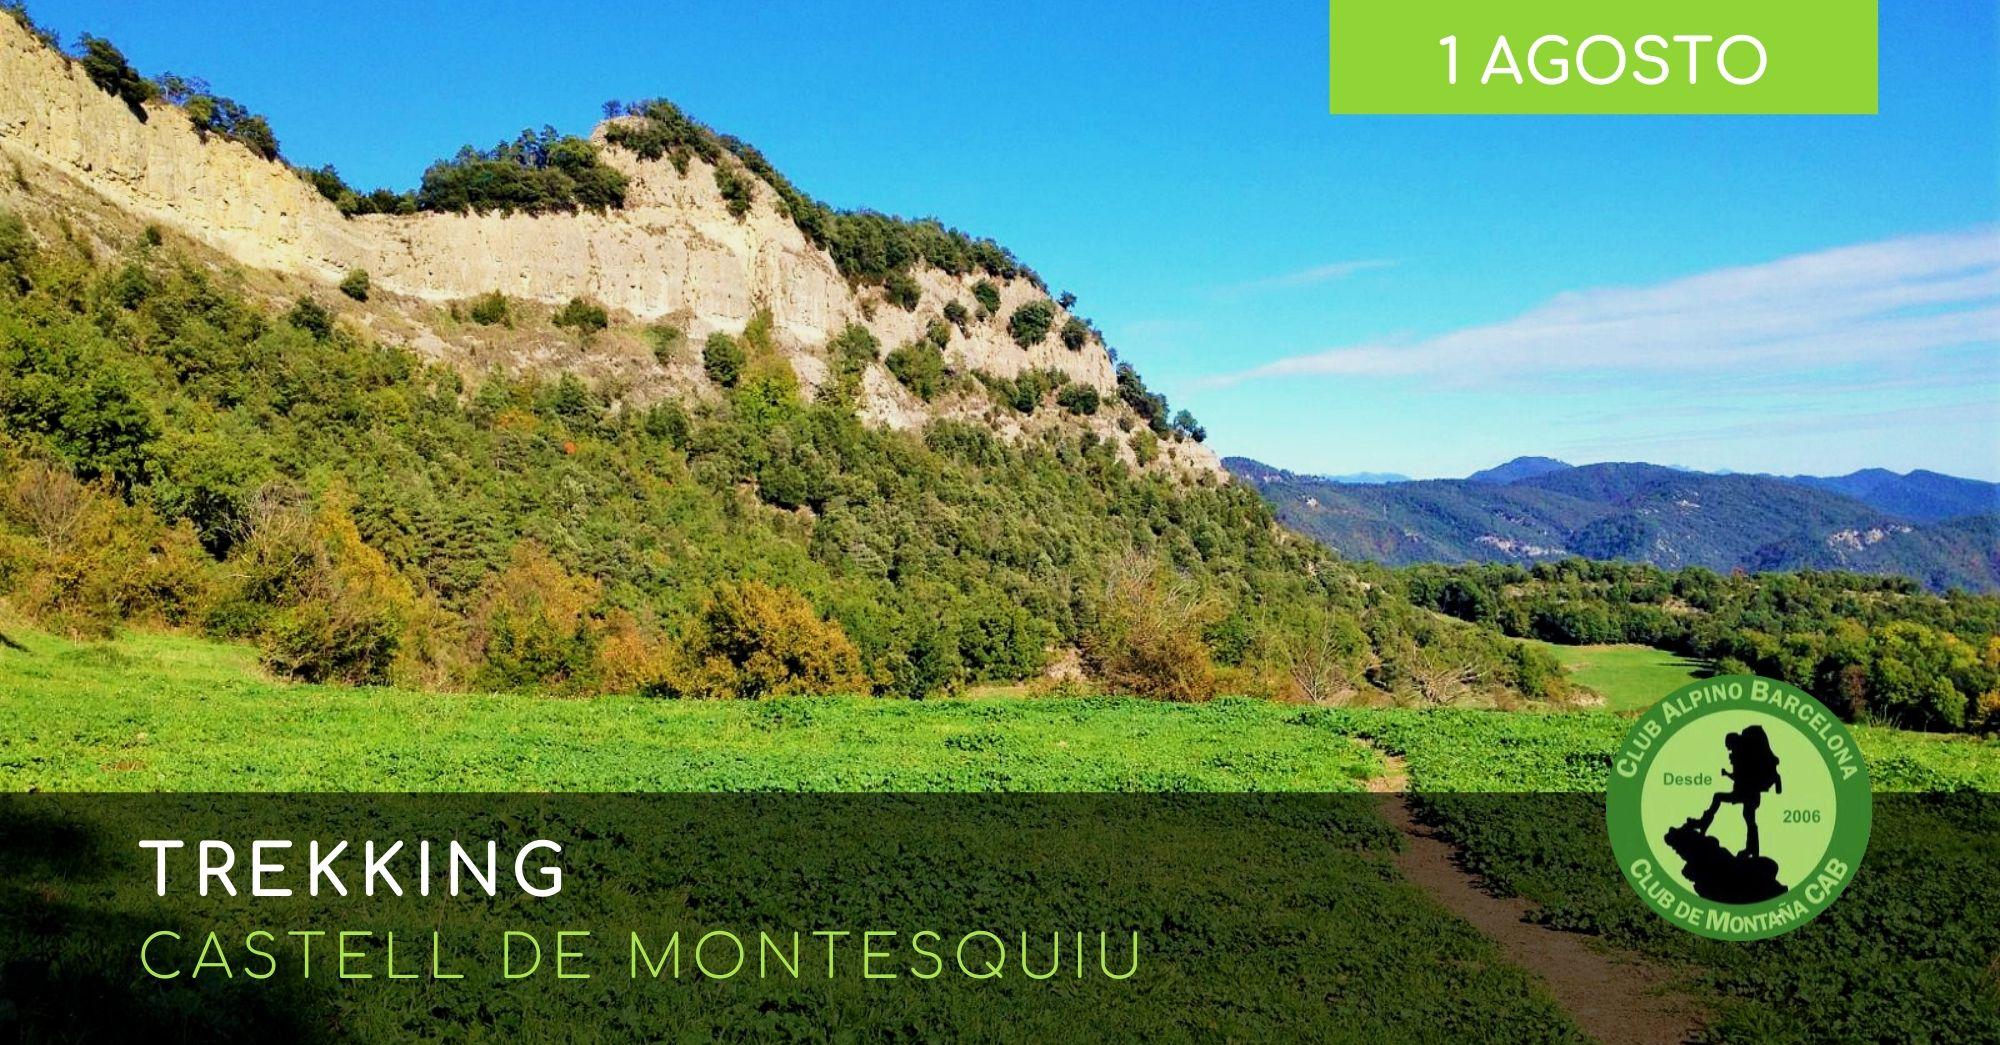 Trekking-Castell de Montesquiu